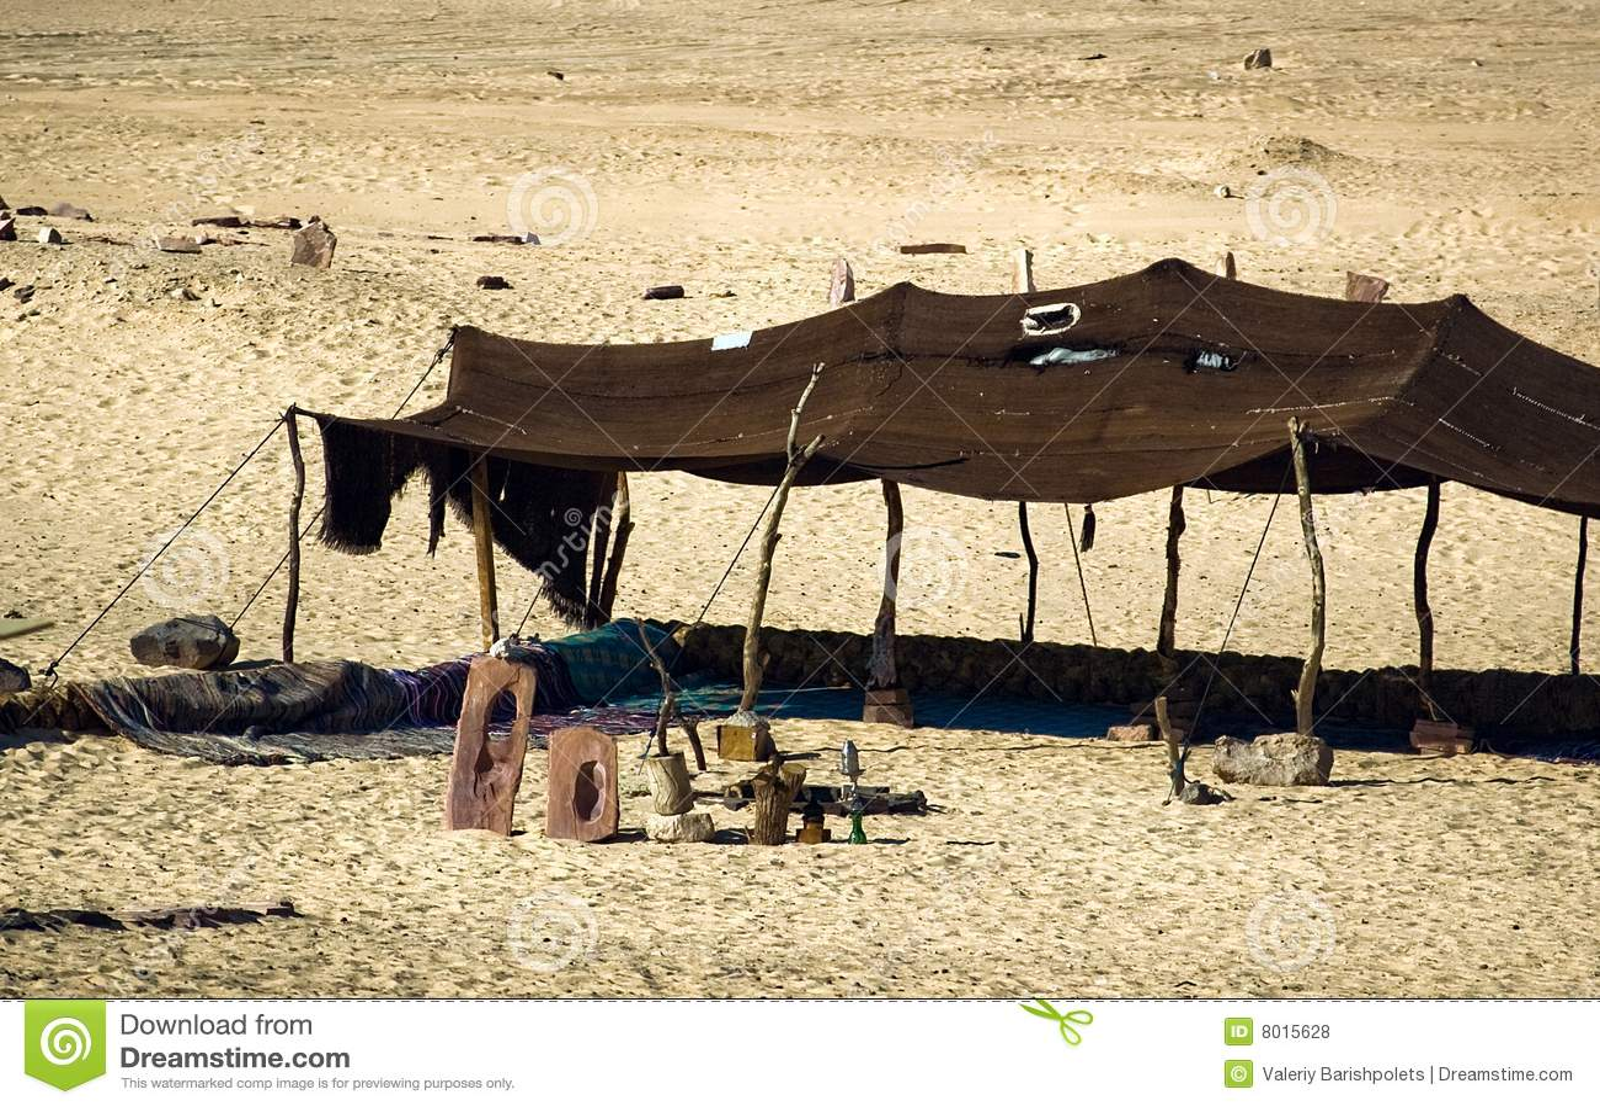 Beduińscy namioty